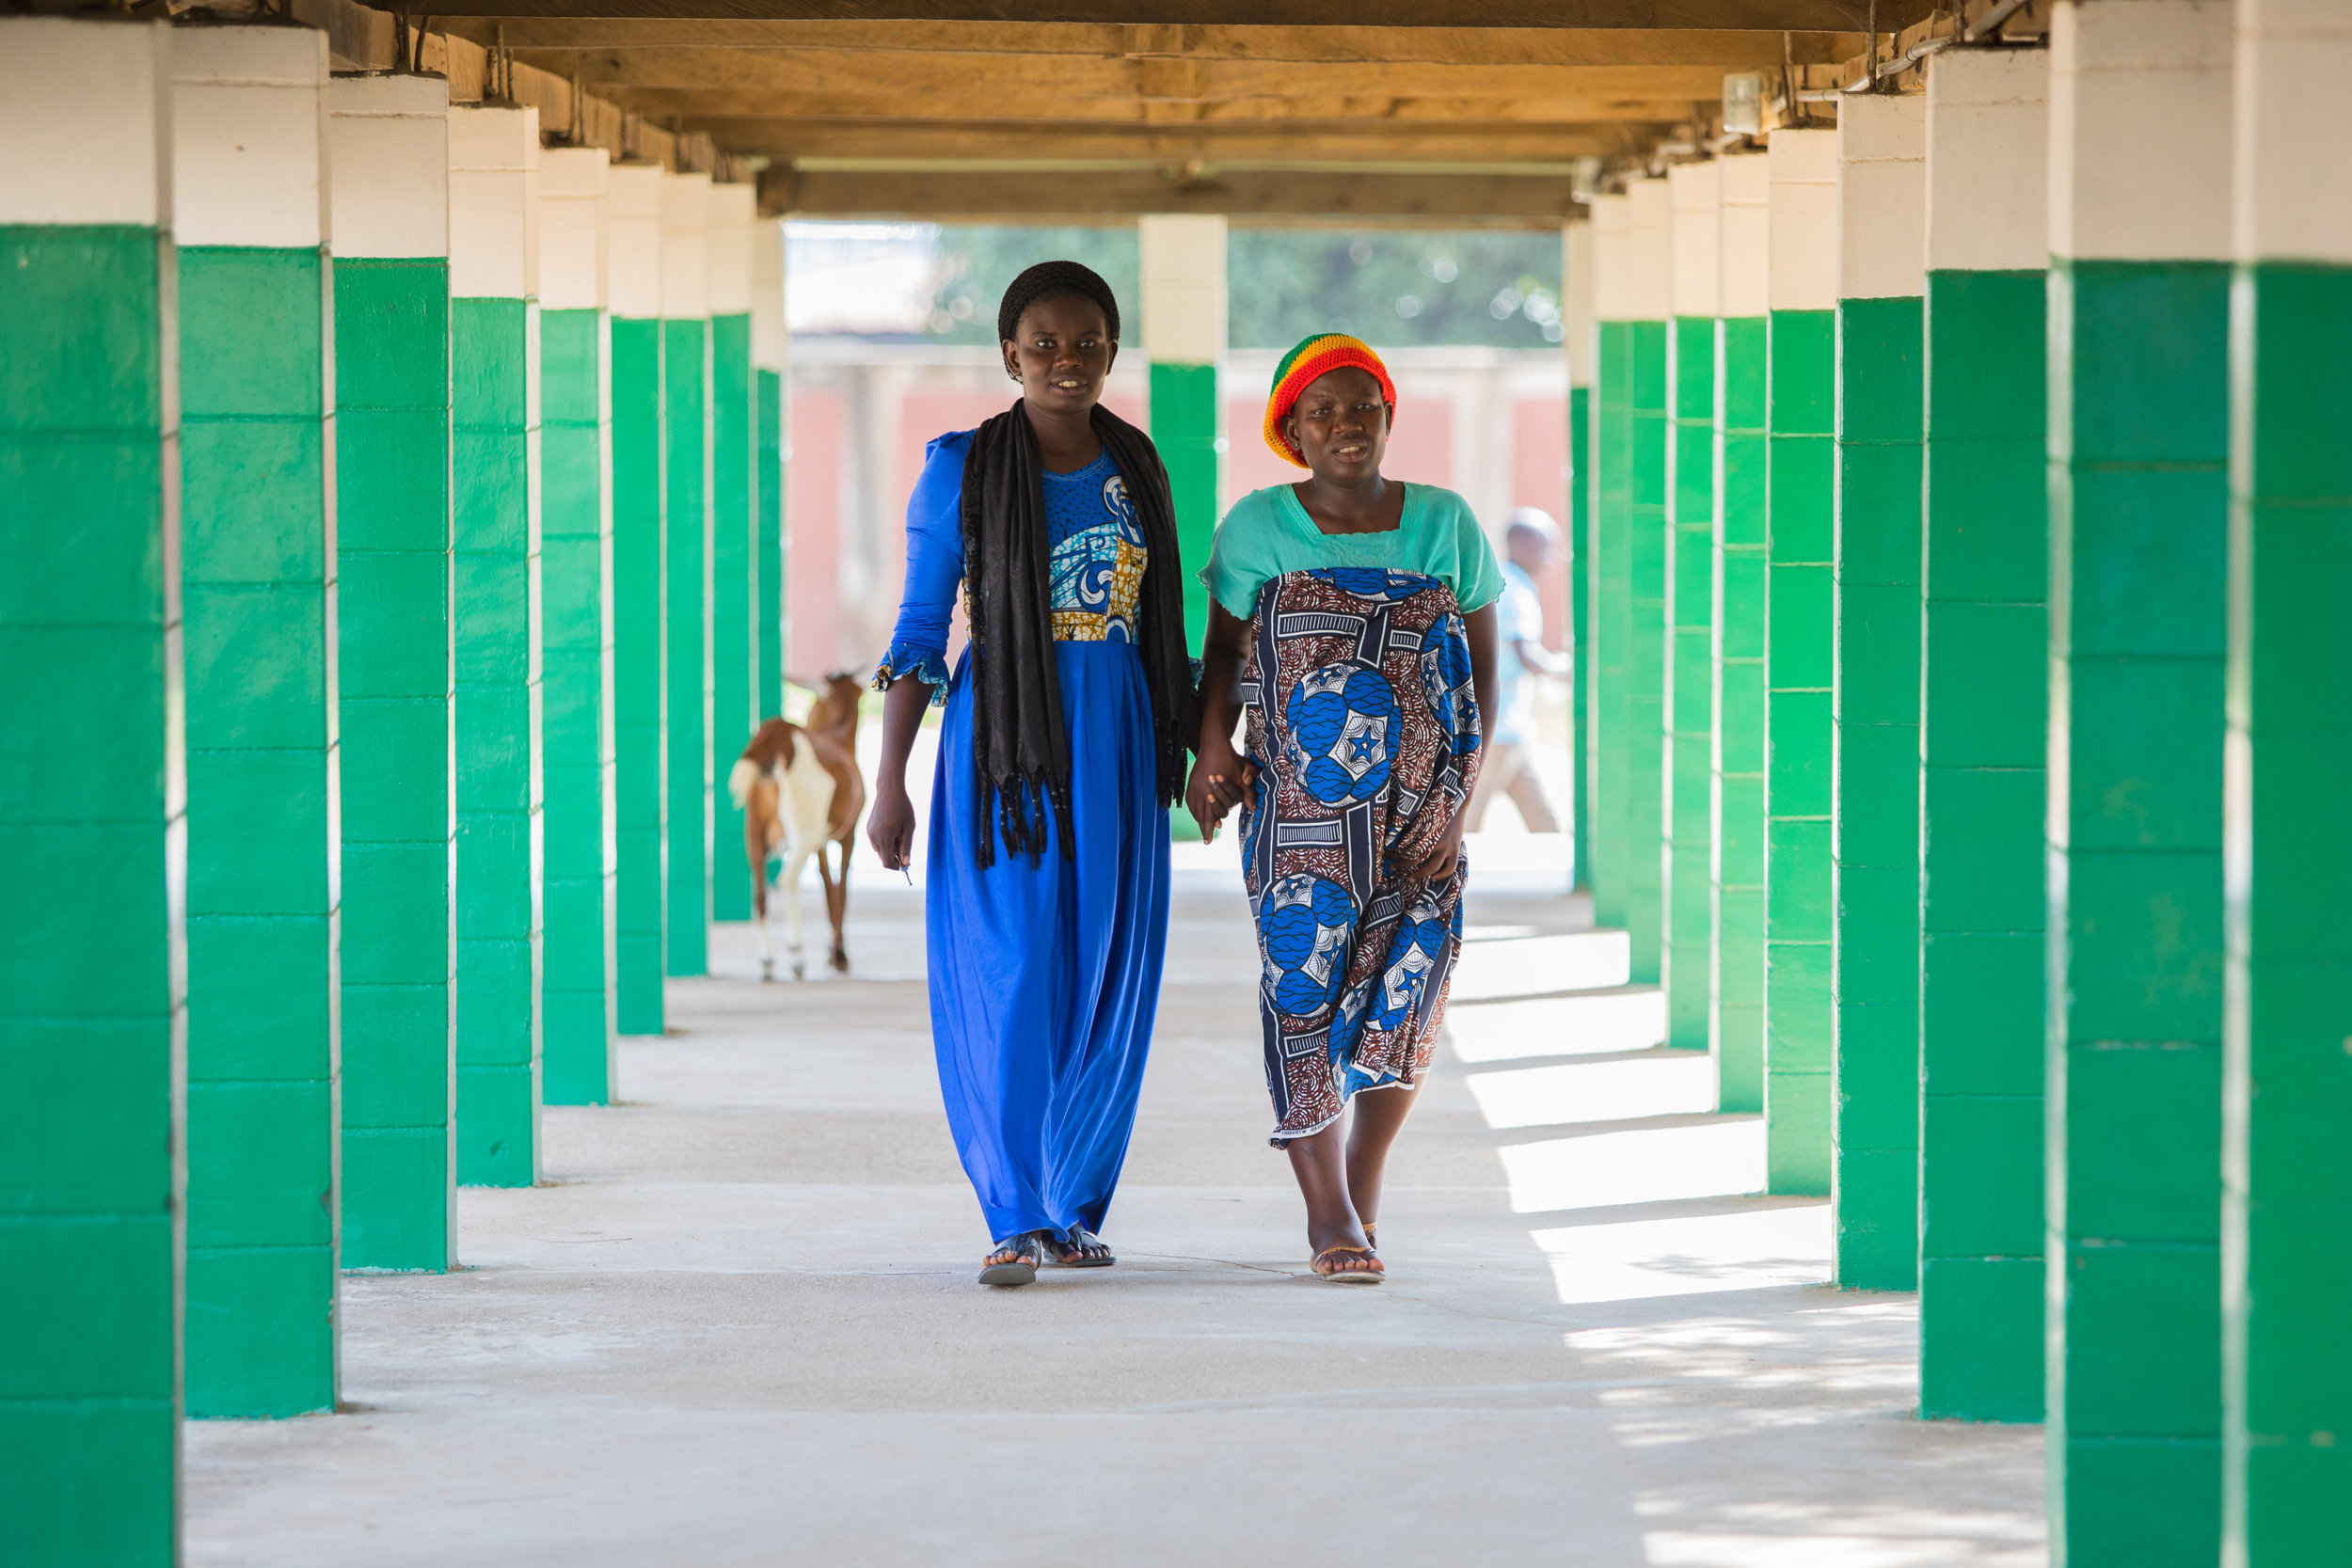 A woman helps her pregnant friend in a hospital in Adamawa state, Nigeria